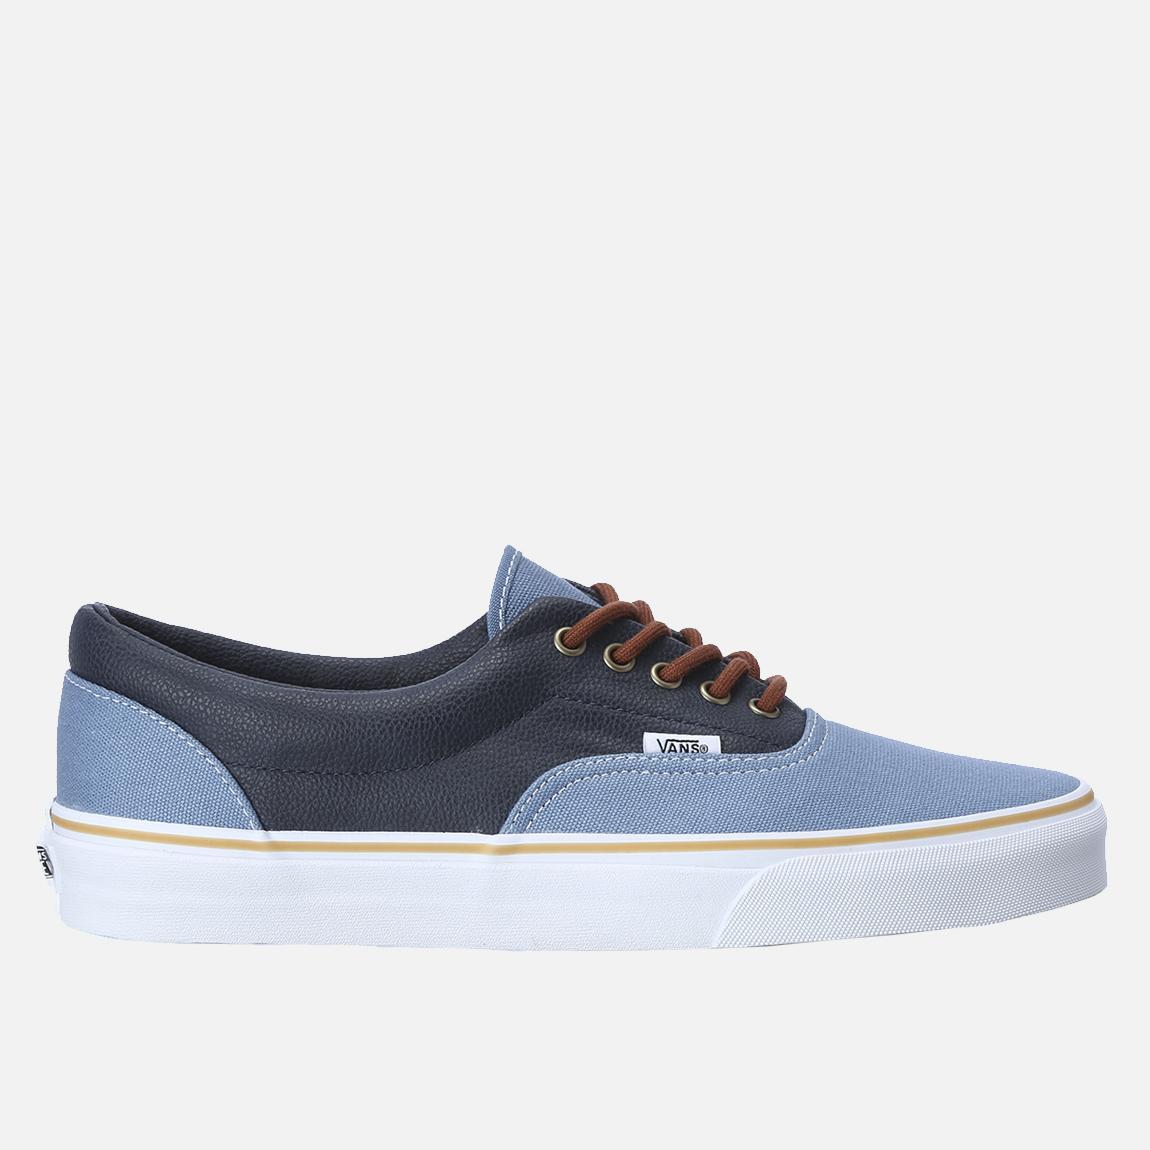 a61c78ec0f Leather Quarter Era – Coronet Blue   Navy Vans Sneakers ...